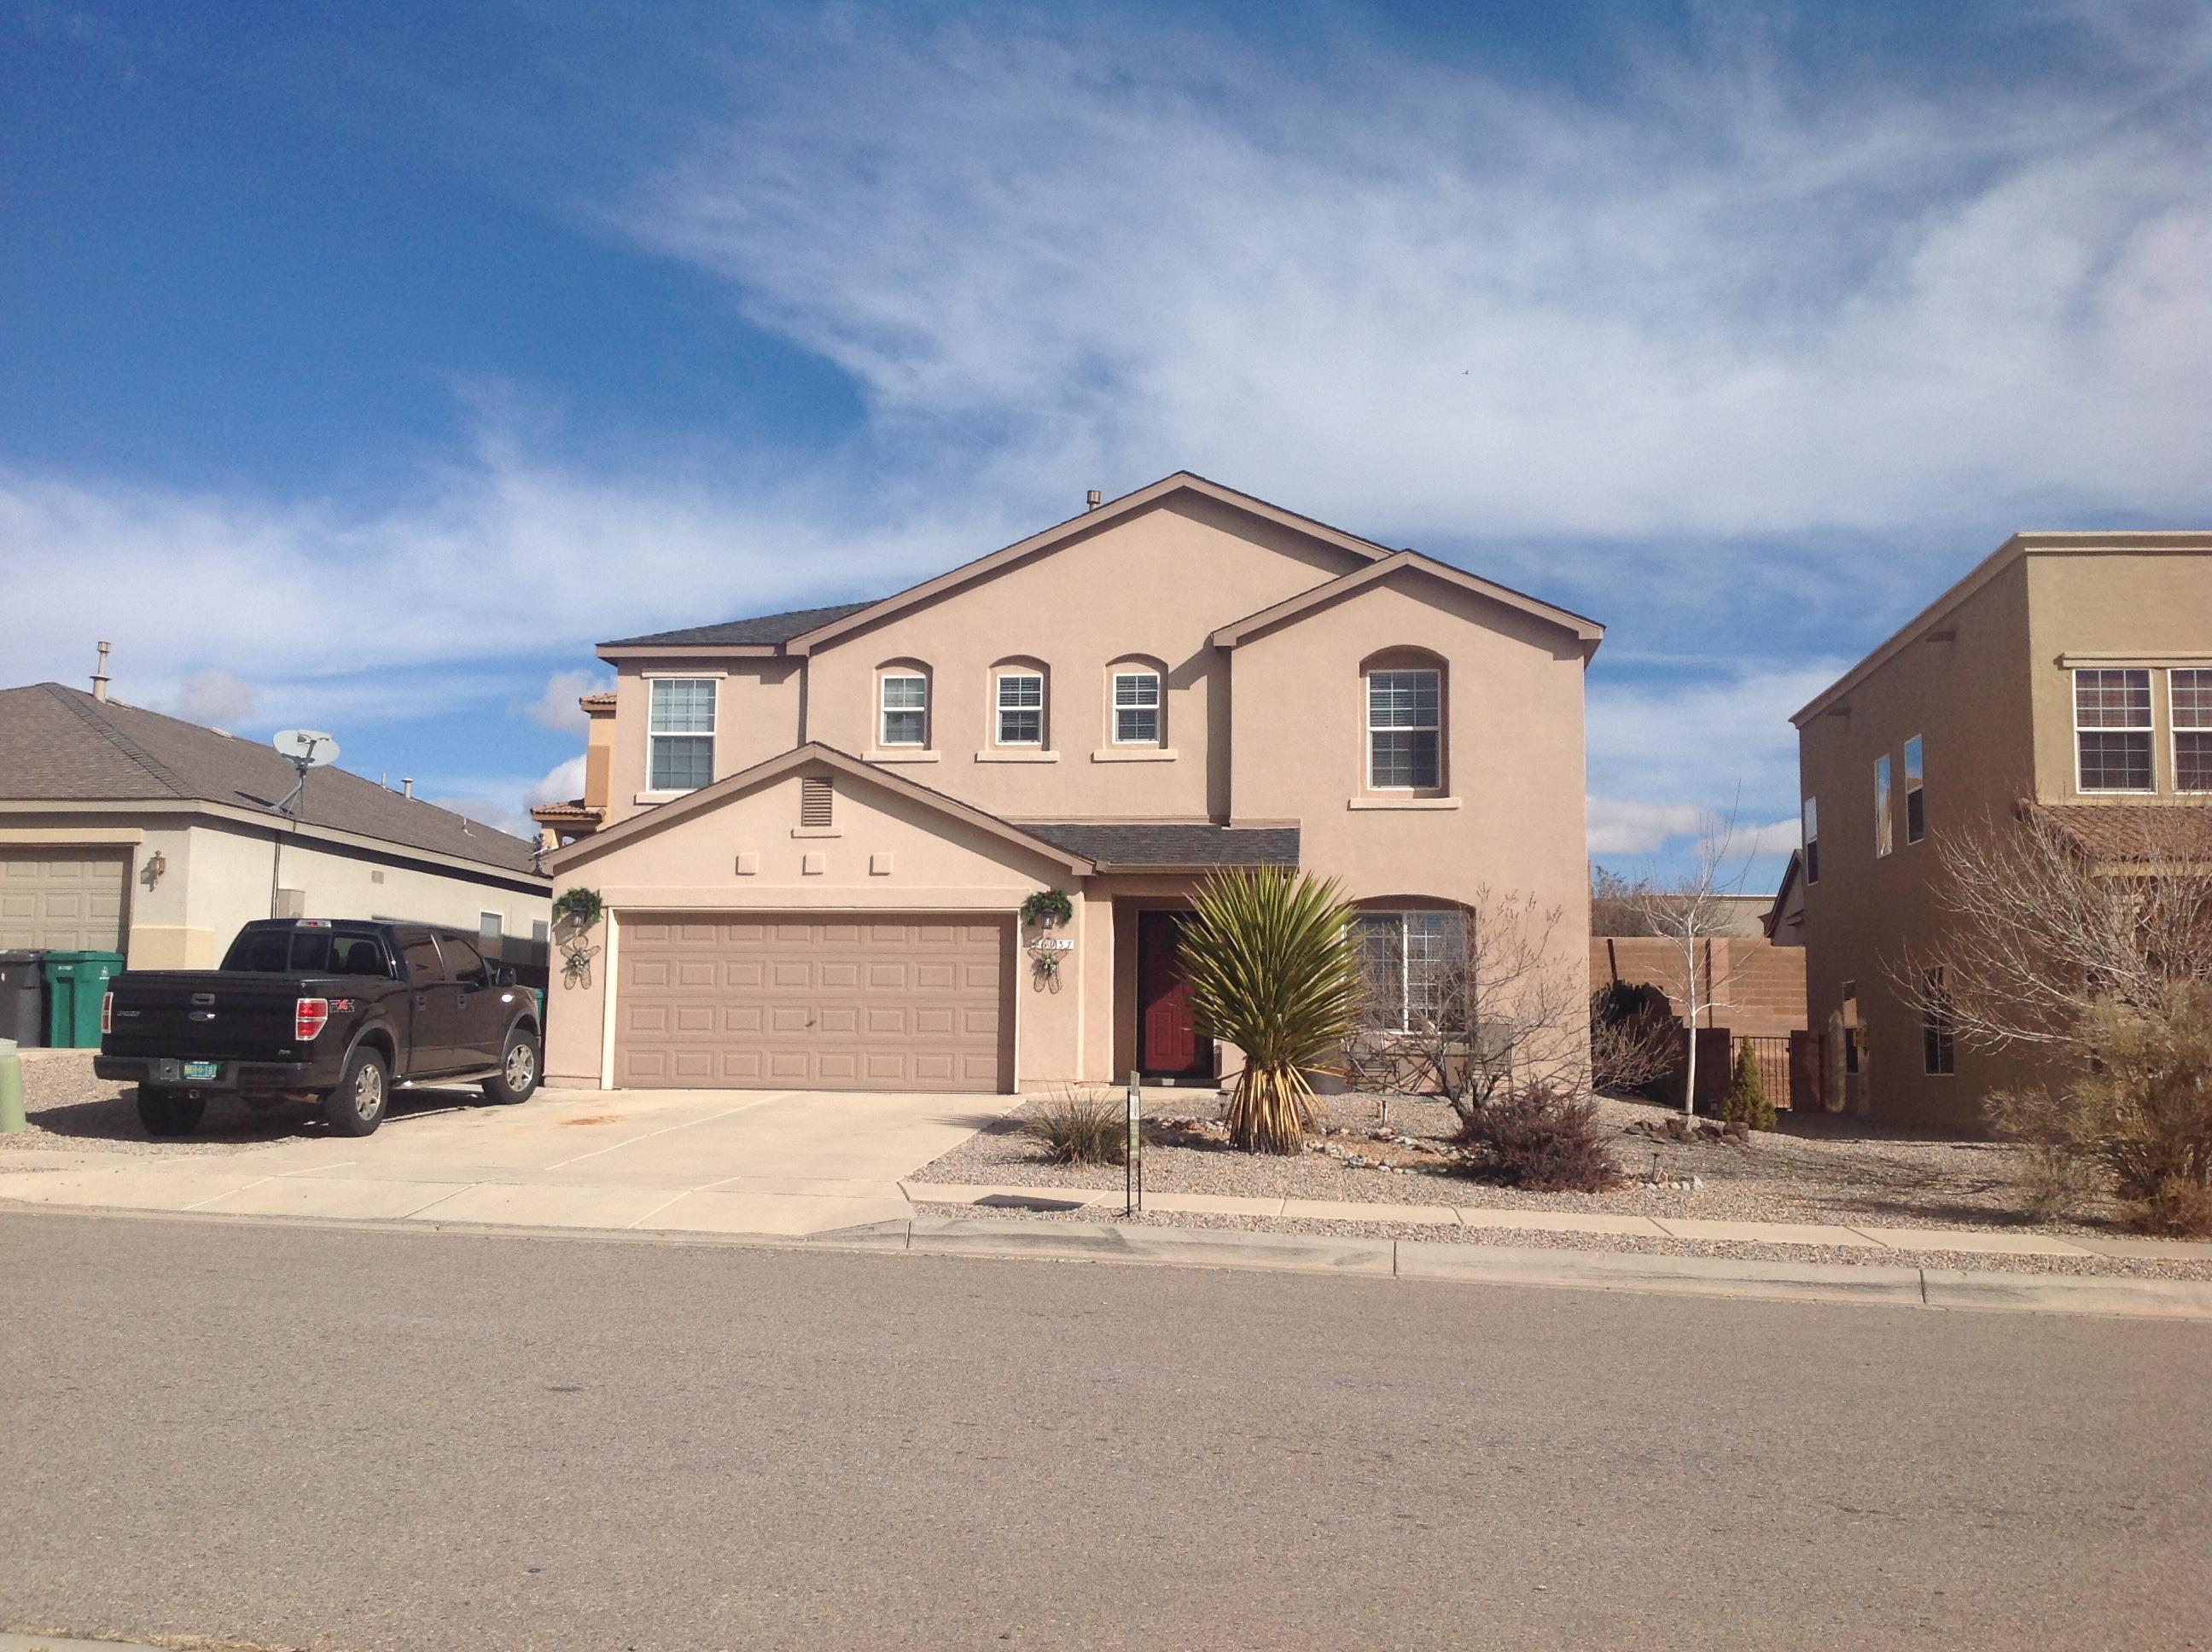 6037 Crownpoint Drive NE, Rio Rancho, NM 87144